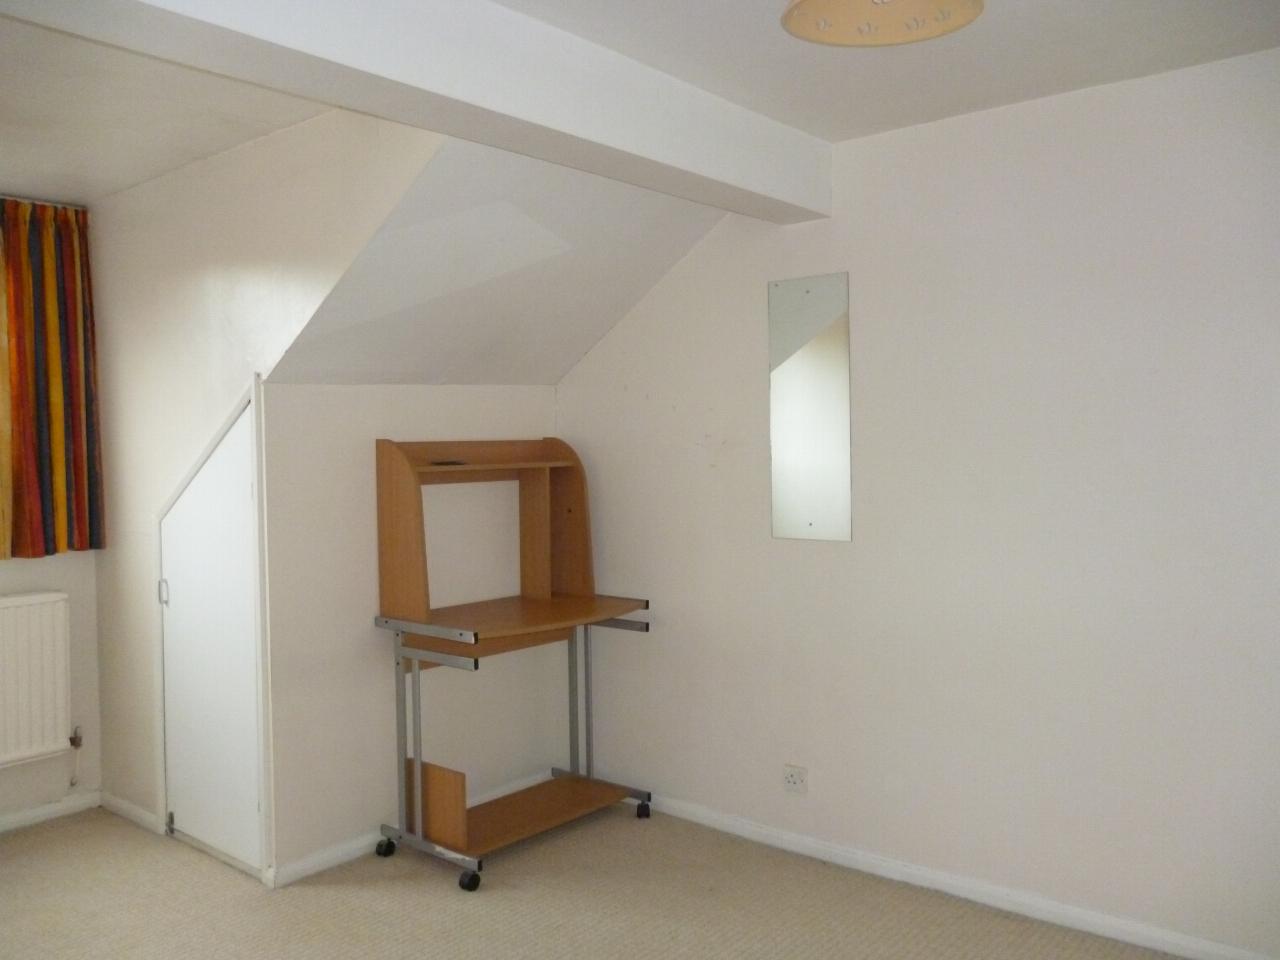 3 Bedroom Apartment Flat/apartment To Let Church Lane 5c Church Lane Image 8